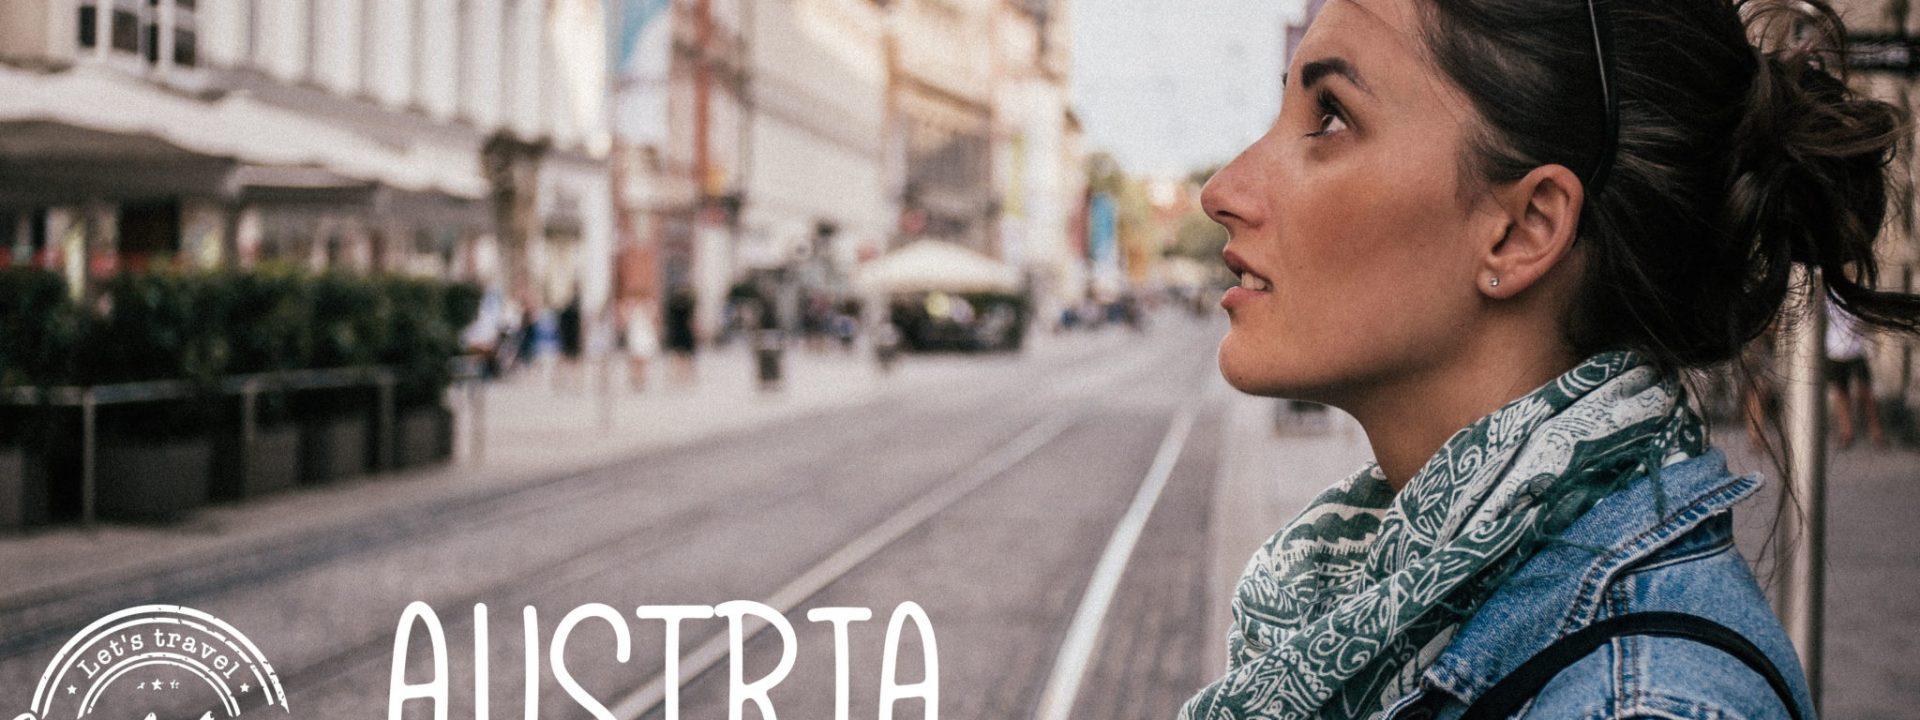 austria-street-1